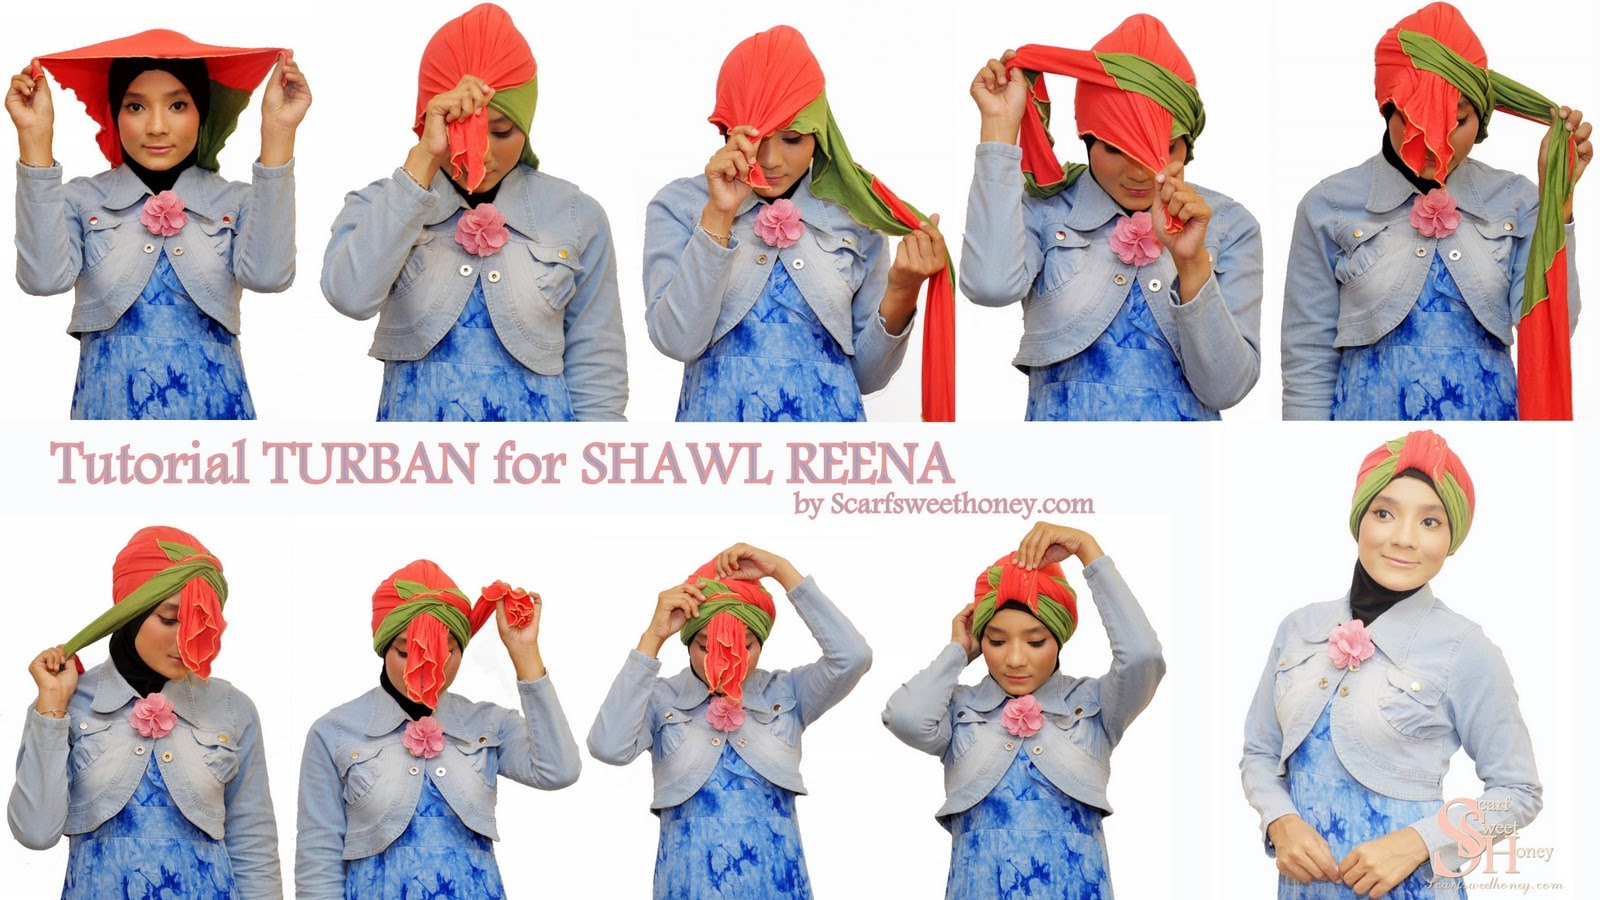 Tutorial Hijab Turban Pesta Ala Dian Pelangi Tutorial Hijab Paling